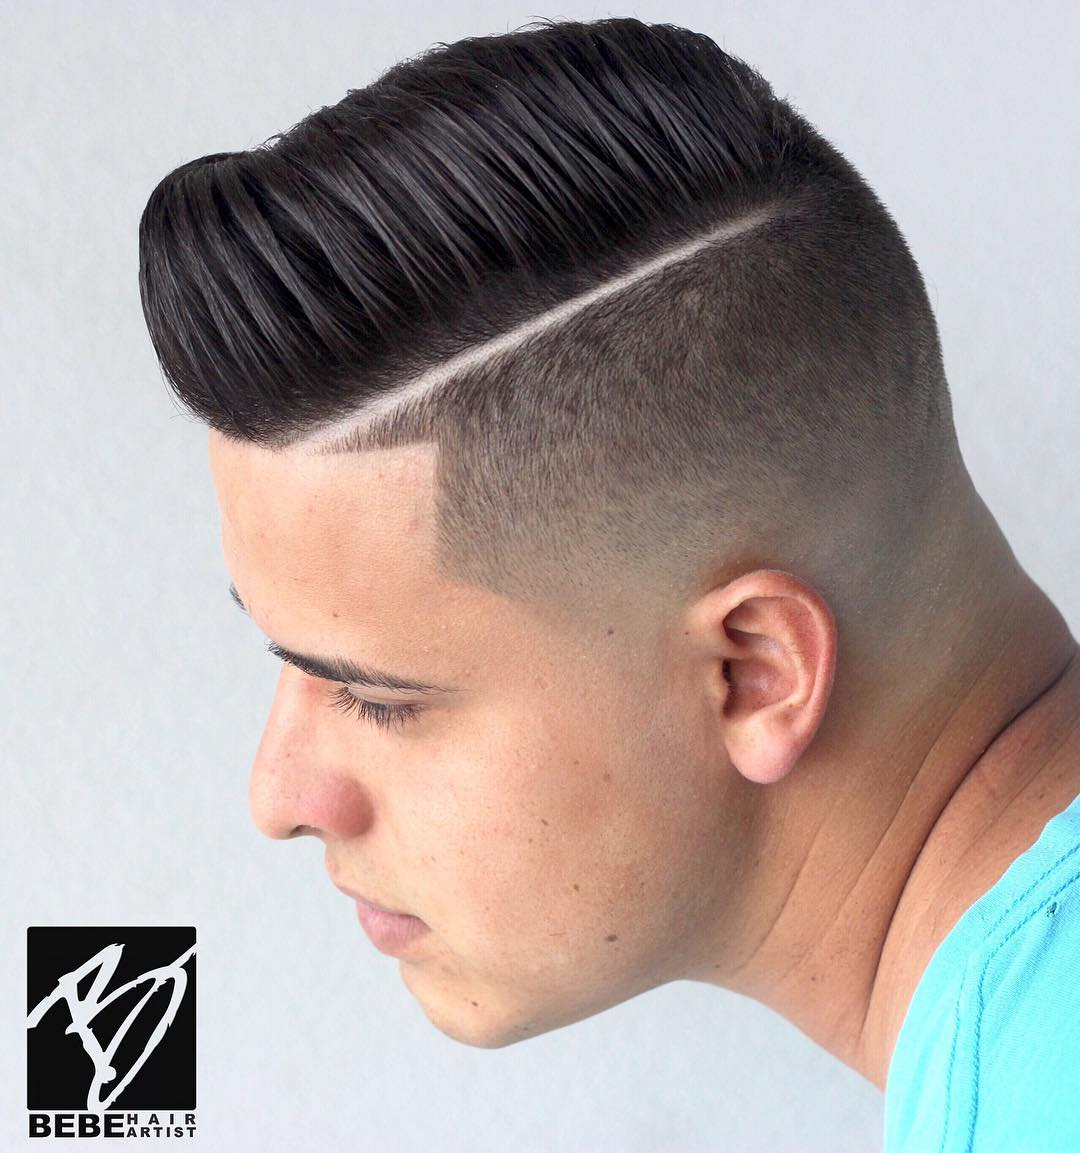 Tagli capelli uomo piu belli